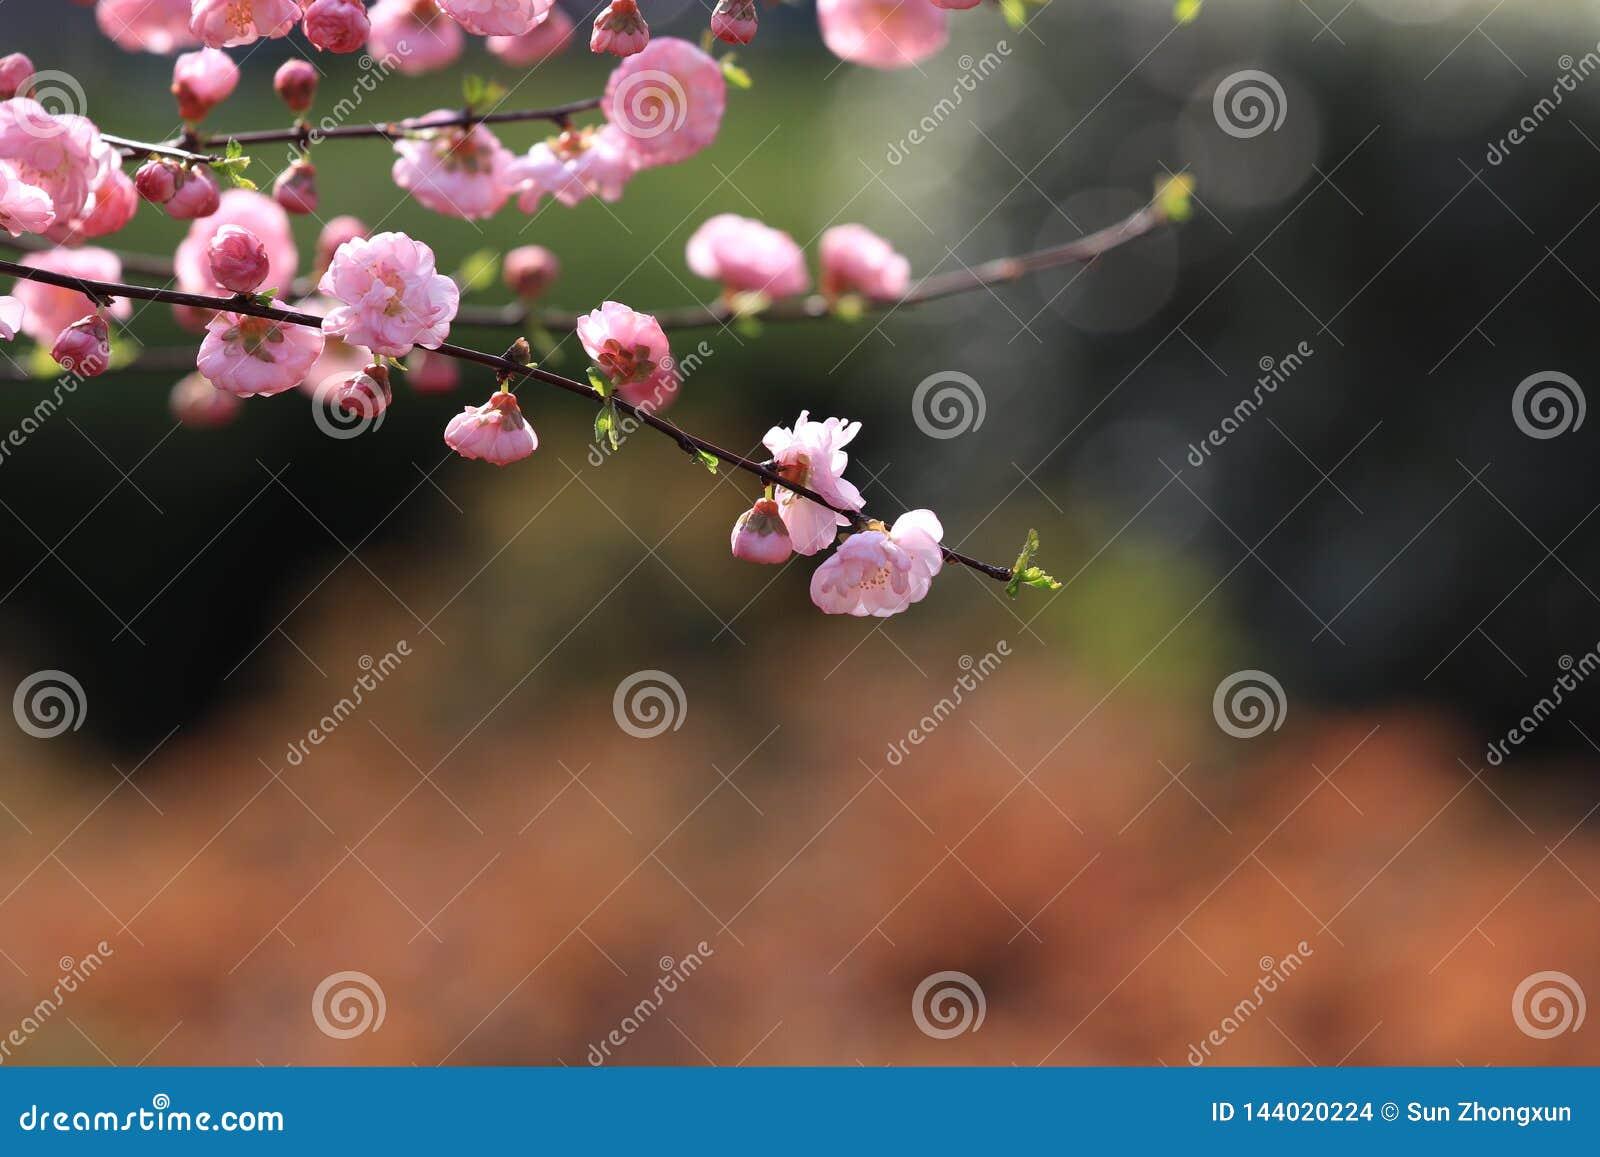 Prunus Mume Meiren Prunus Blireana Cv Meiren Stock Photo